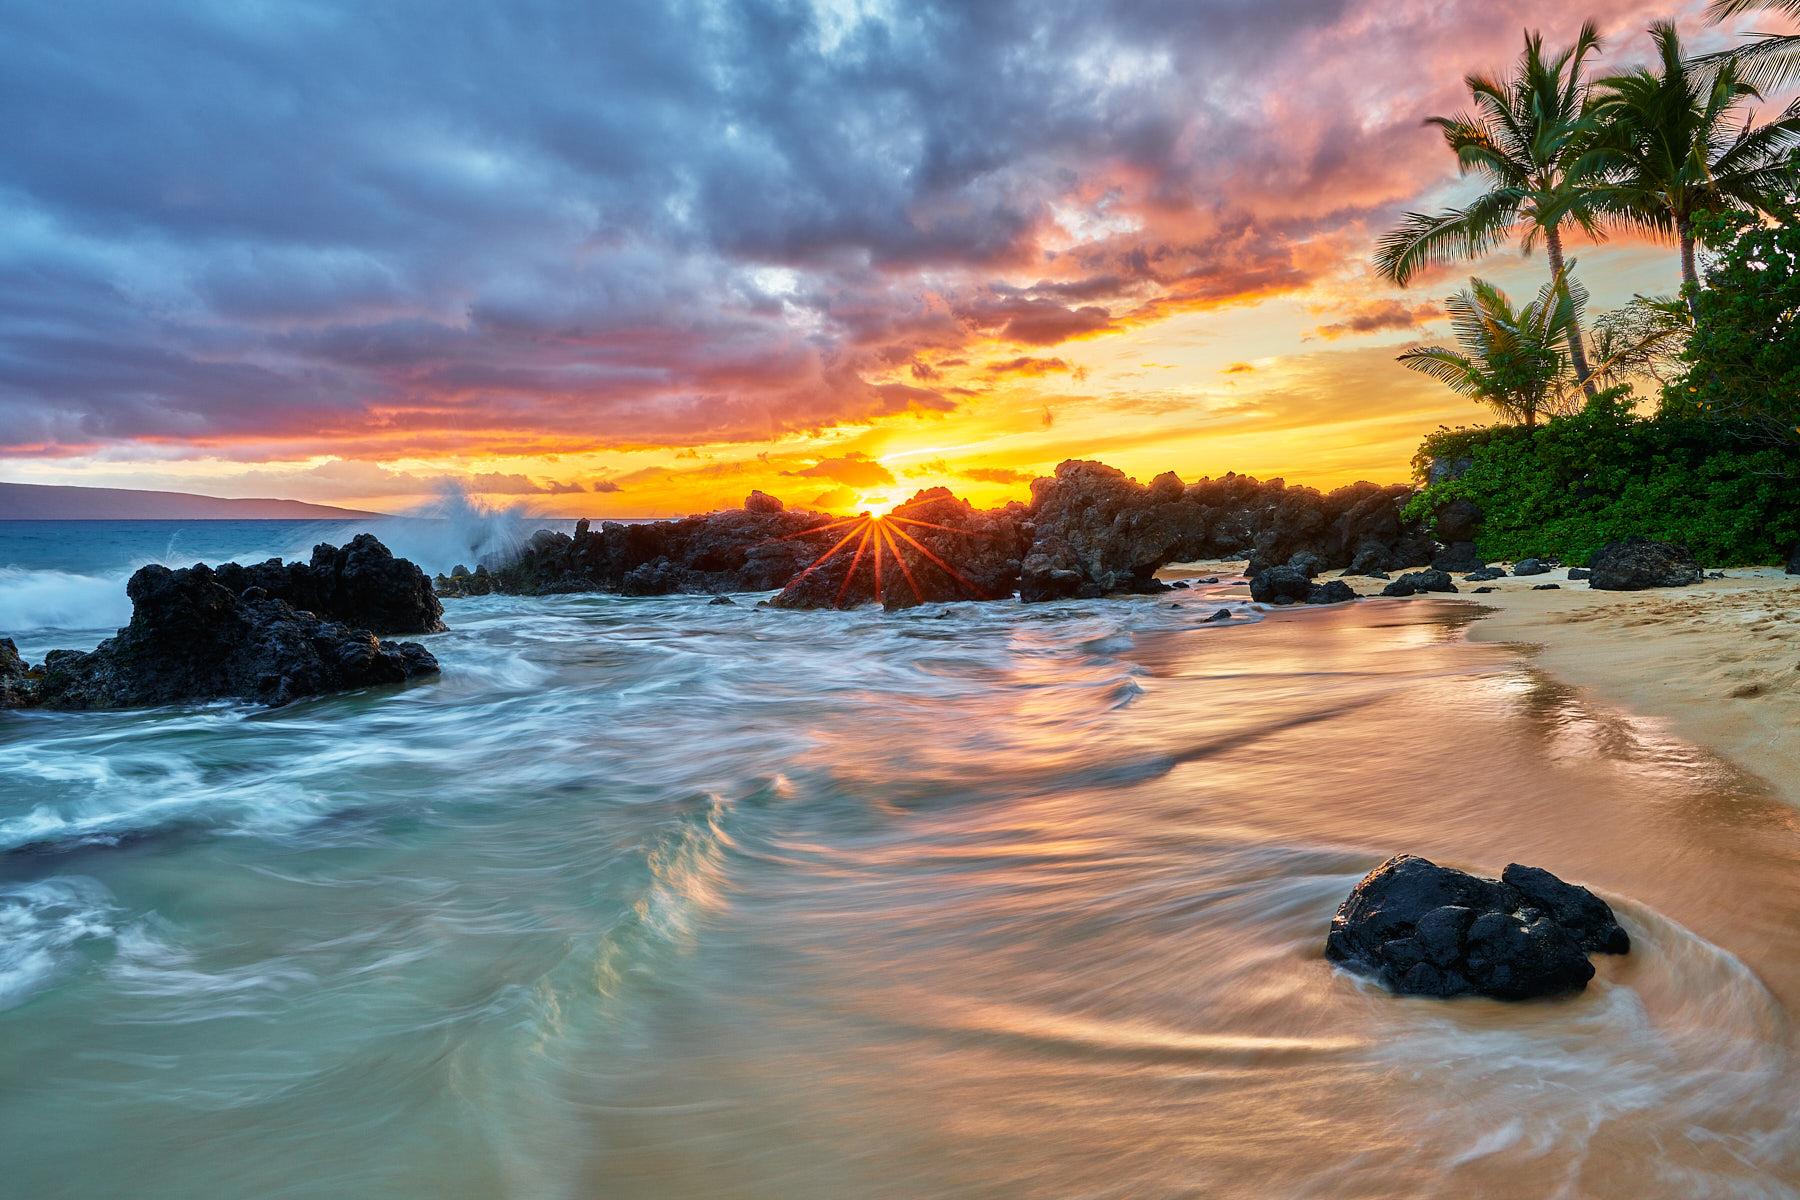 beach sunset on a golden sand beach just south of Secret Beach in Makena on the island of Maui with a sun star